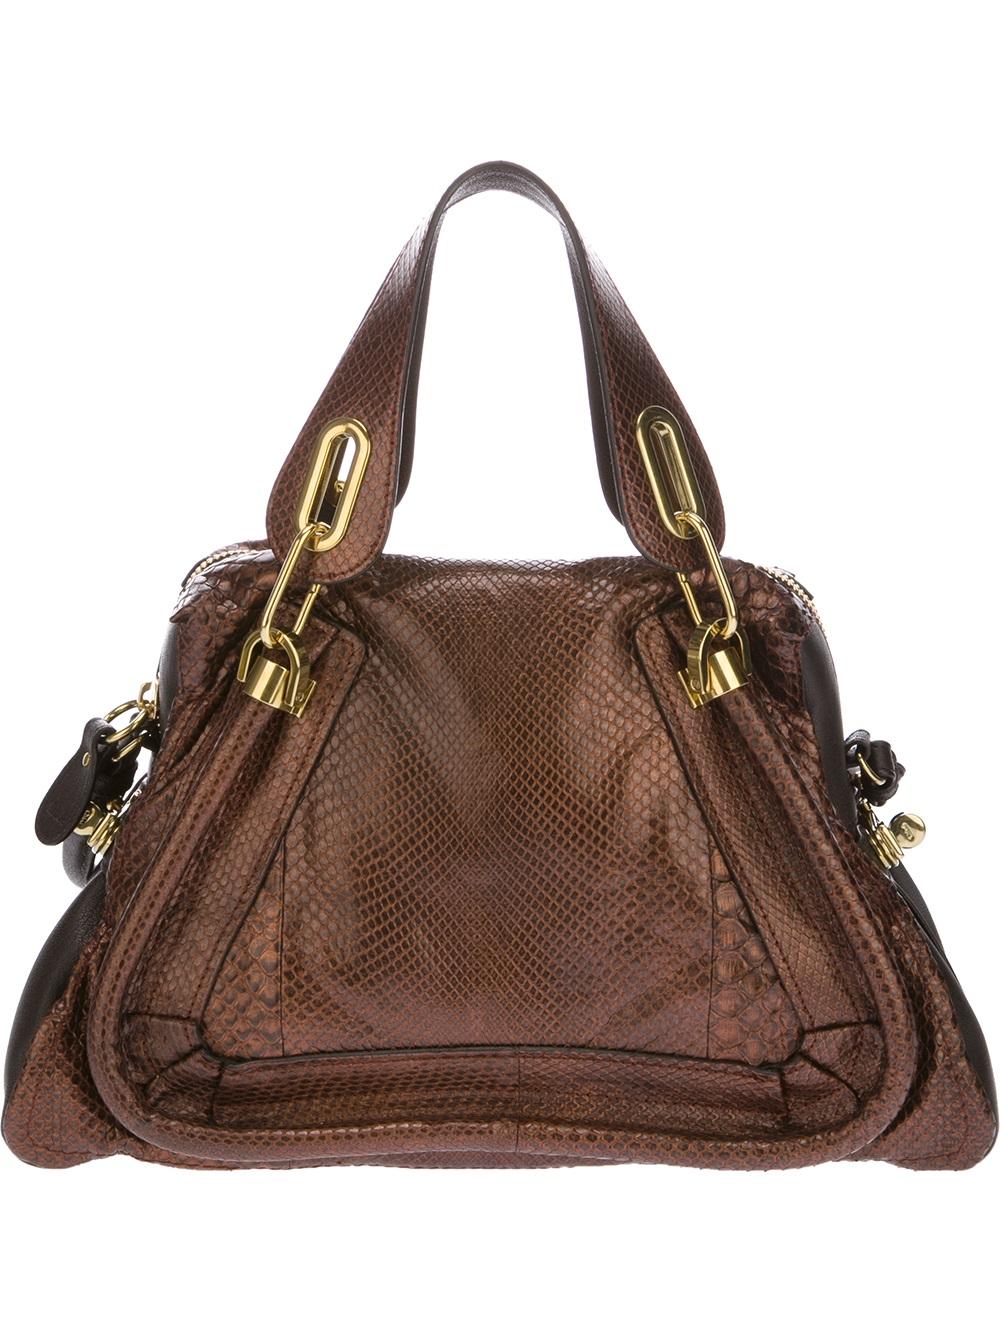 Chlo¨¦ Paraty Python Skin Shoulder Bag in Brown | Lyst